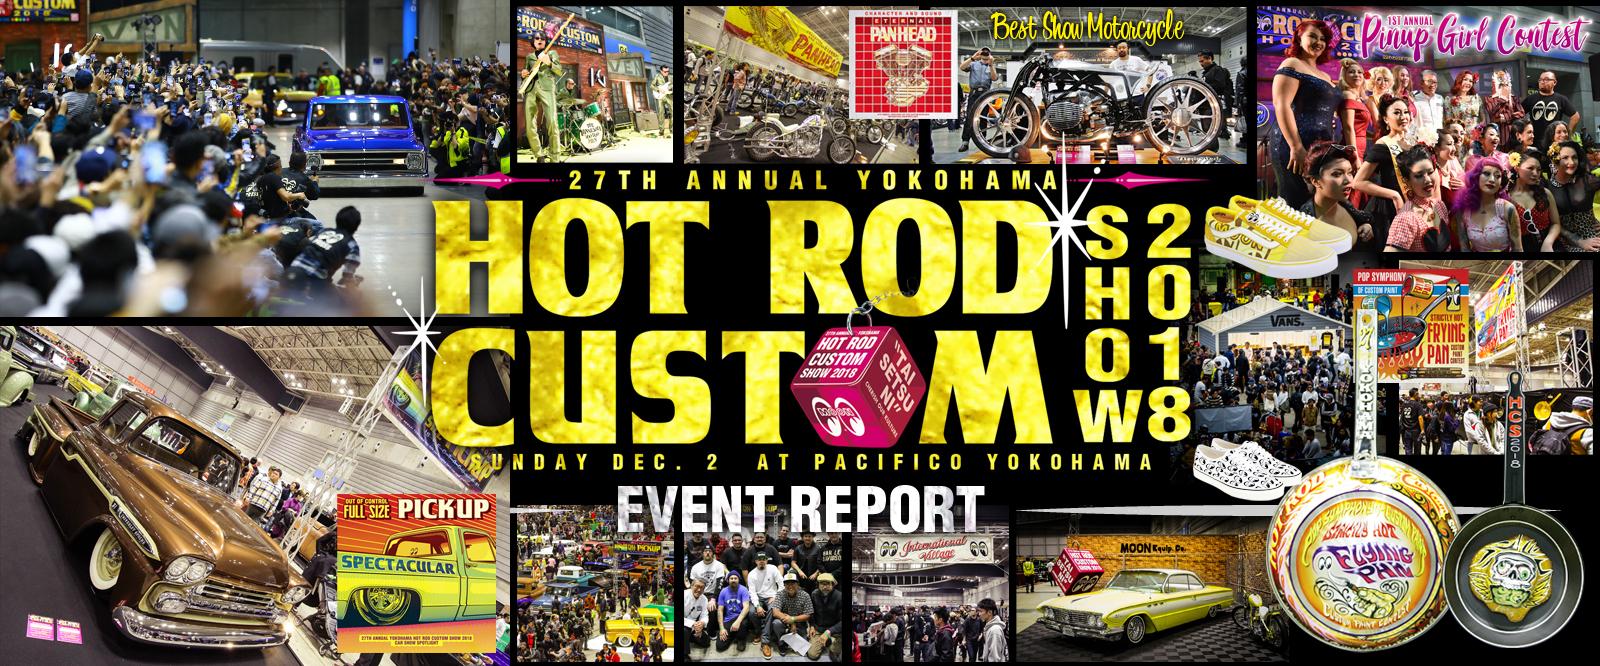 YOKOHAMA HOT ROD CUSTOM SHOW 2018 Event Report